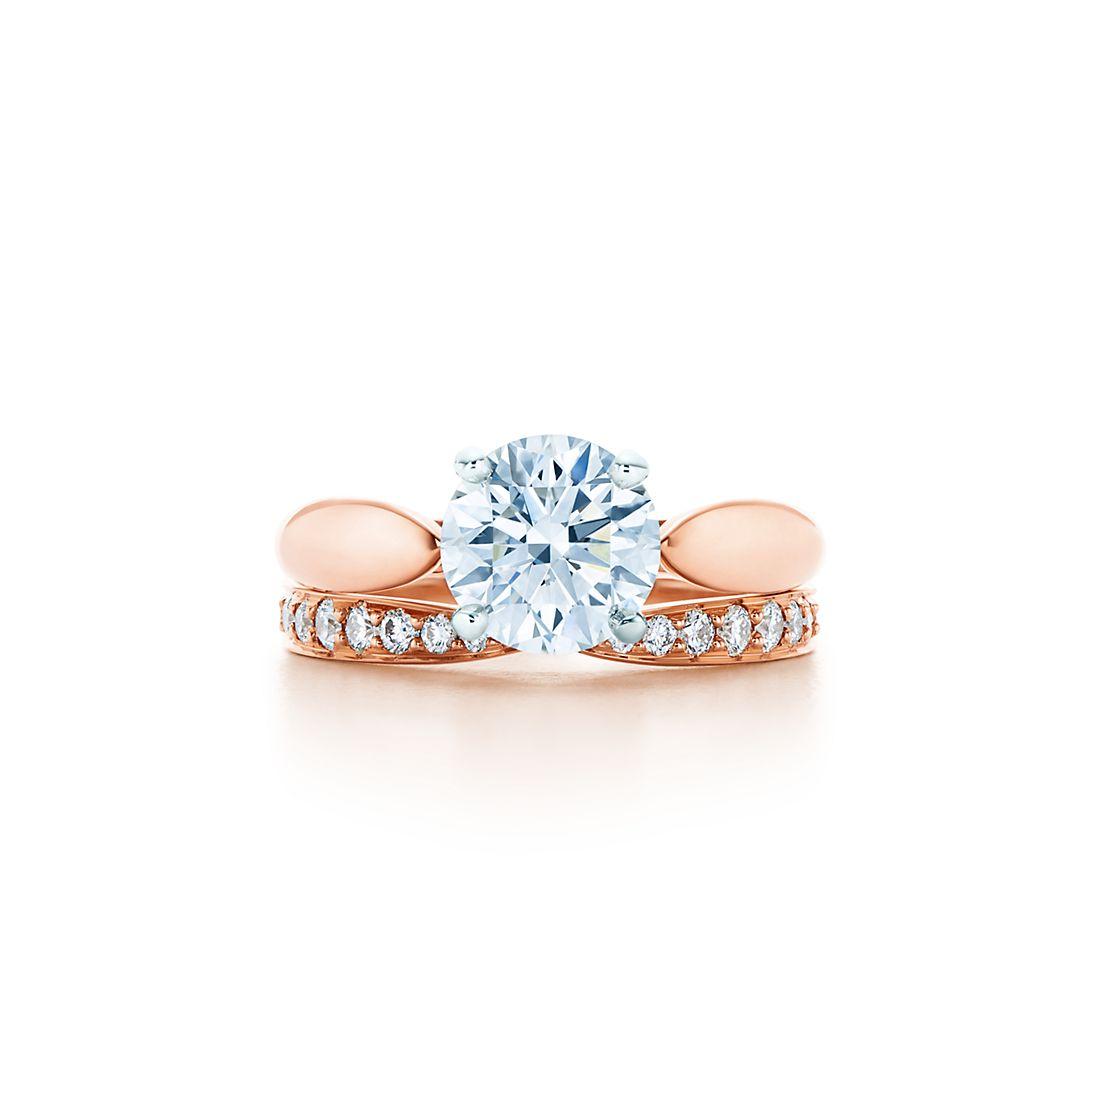 Tiffany Harmony 18k Rose Gold Engagement Rings Tiffany Co